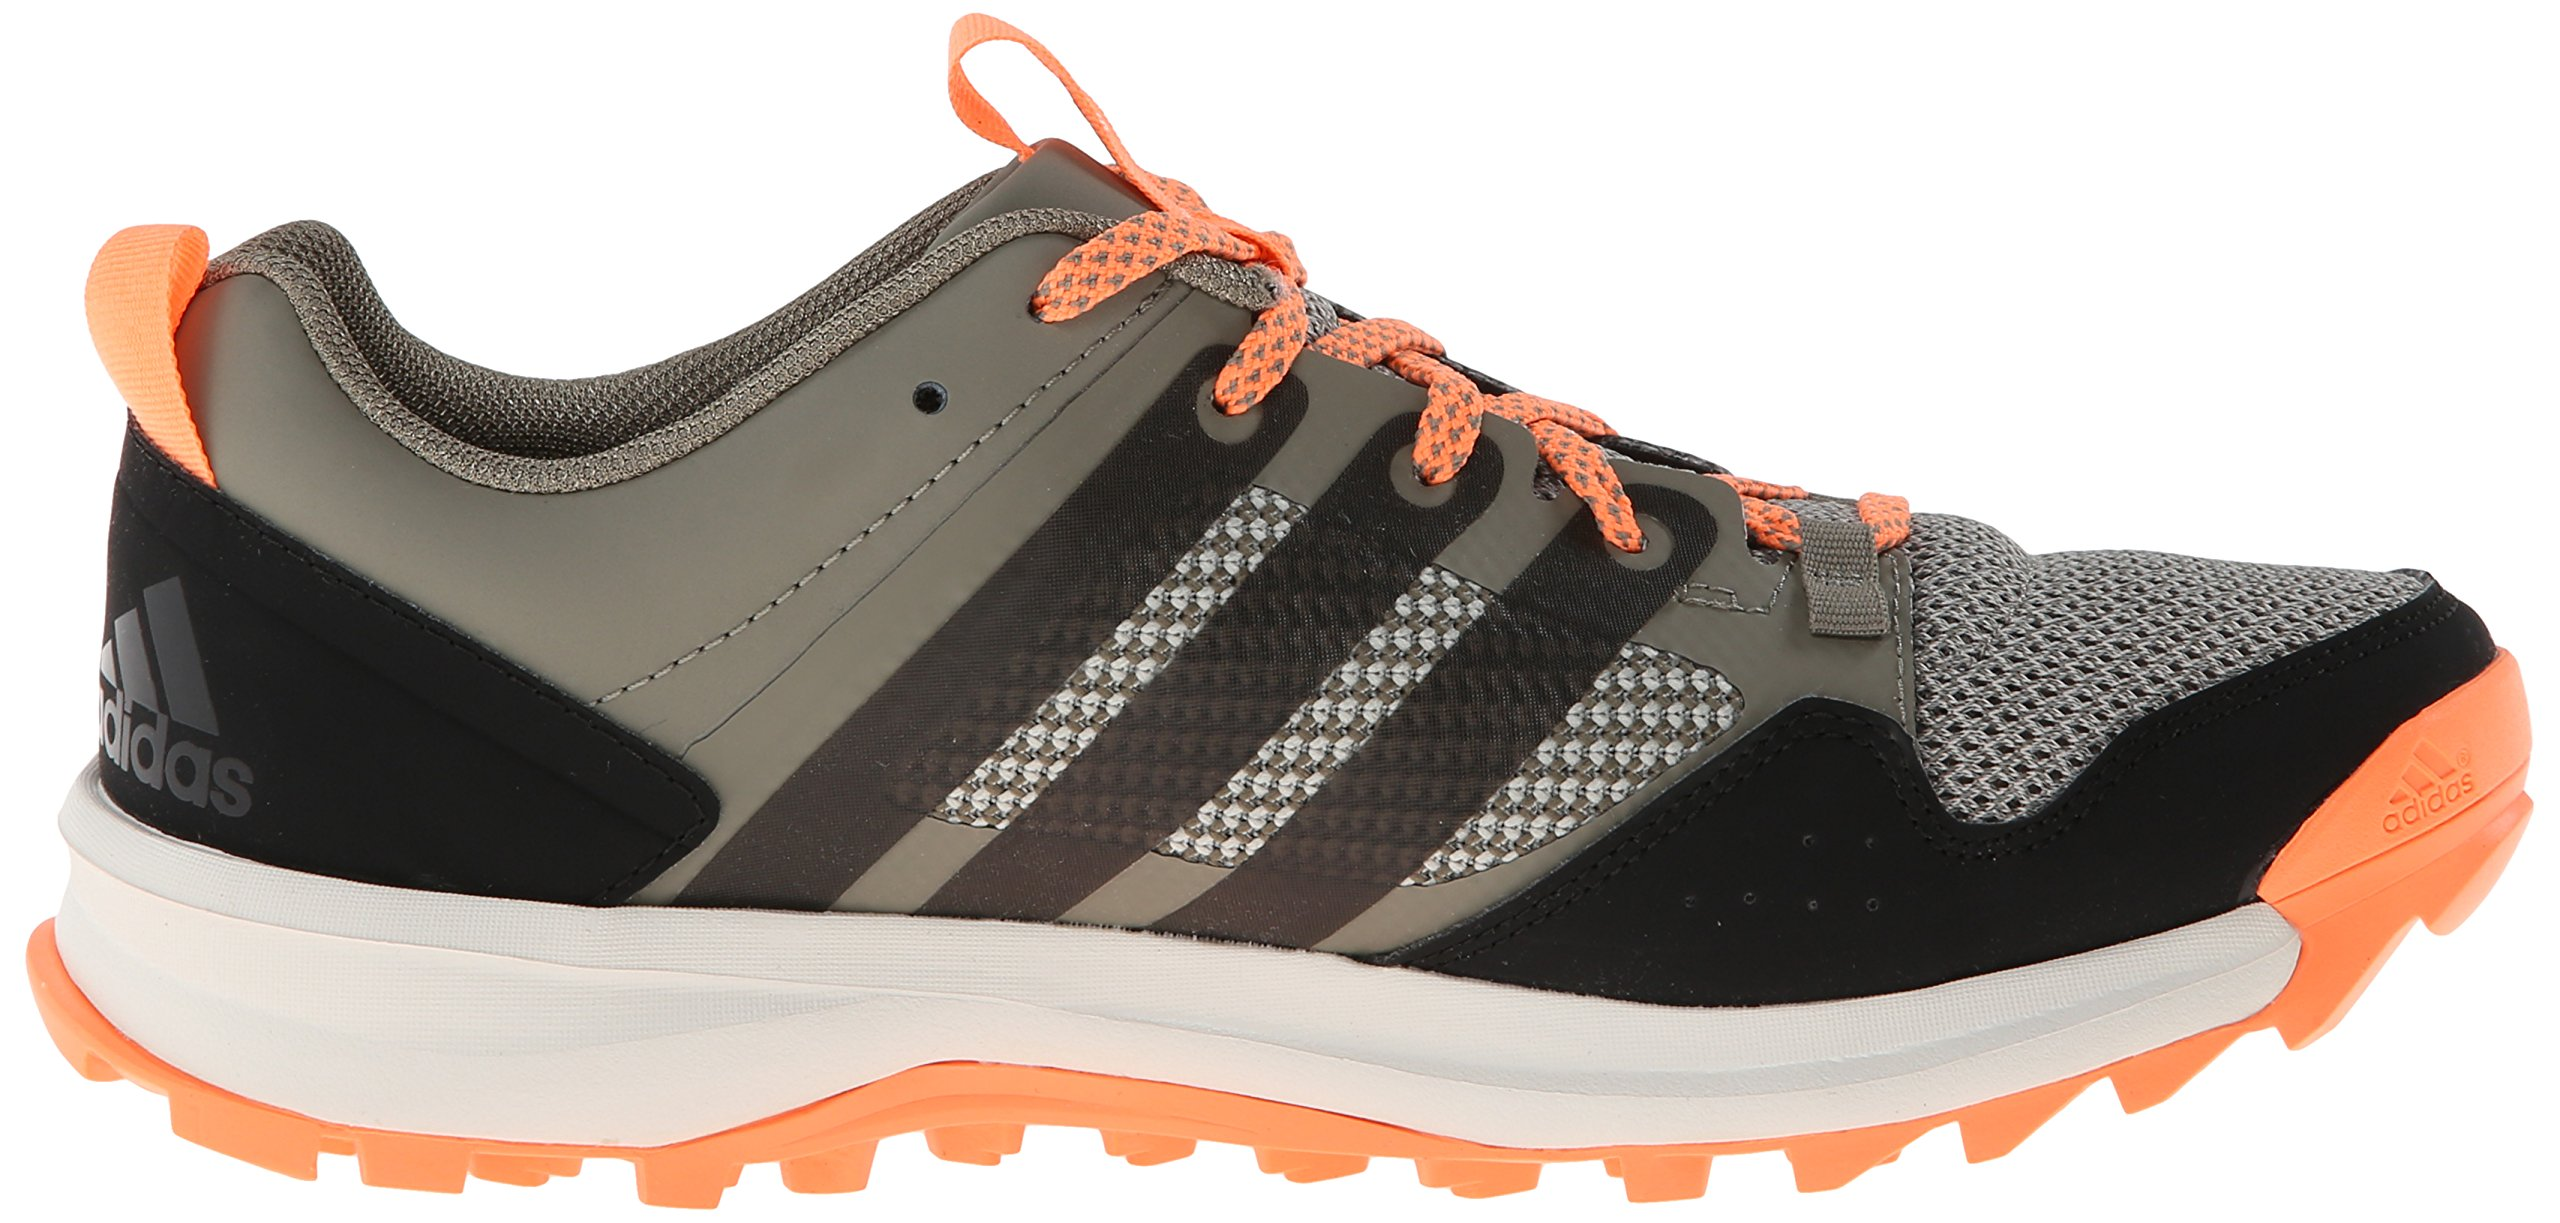 adidas Performance Women's Kanadia 7 TR W Trail Running Shoe, Clay/Chalk/Flash Orange, 7 M US by adidas (Image #7)